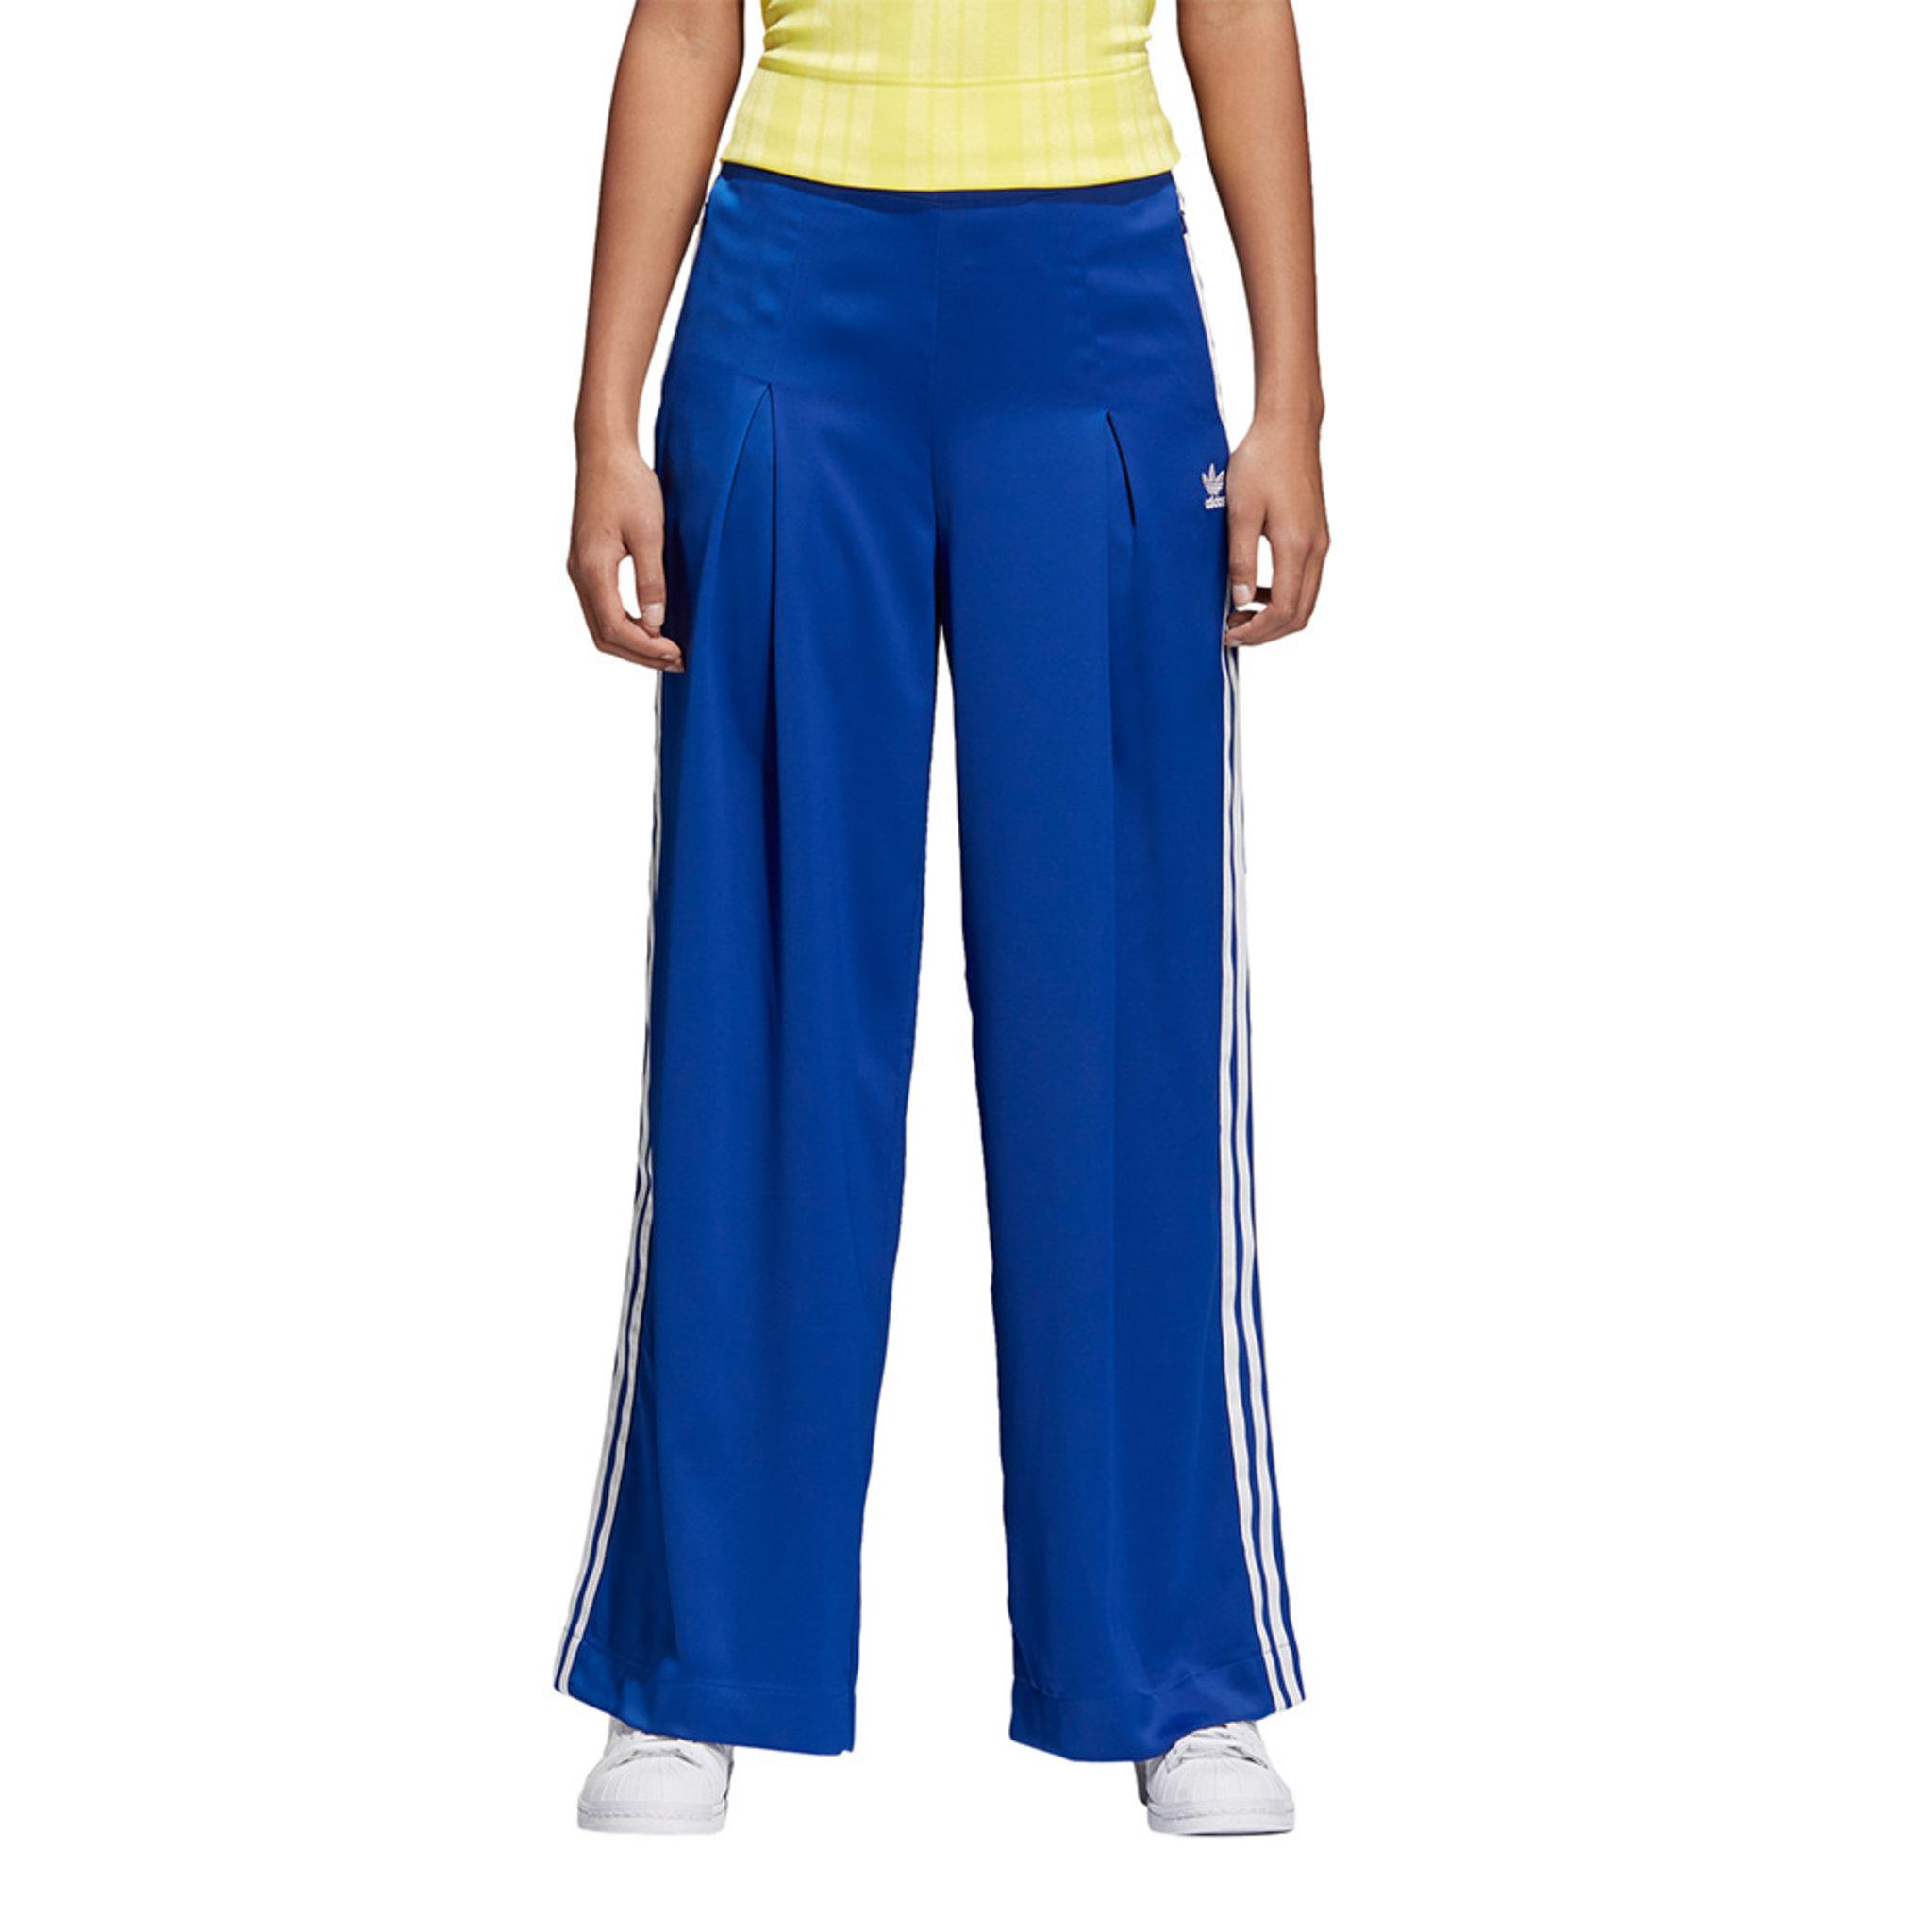 Fashion League Pants